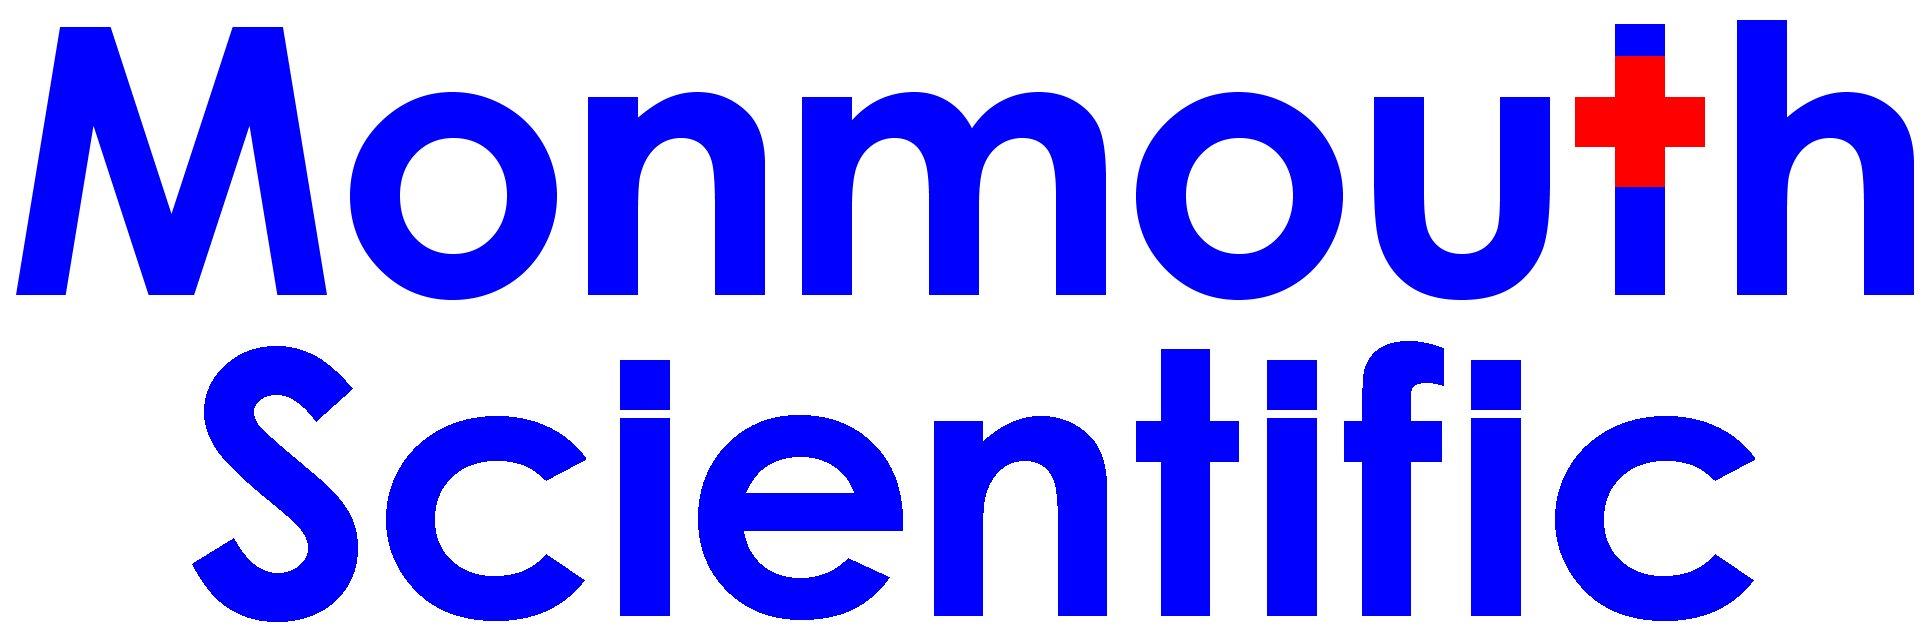 Monmouth Scientific logo